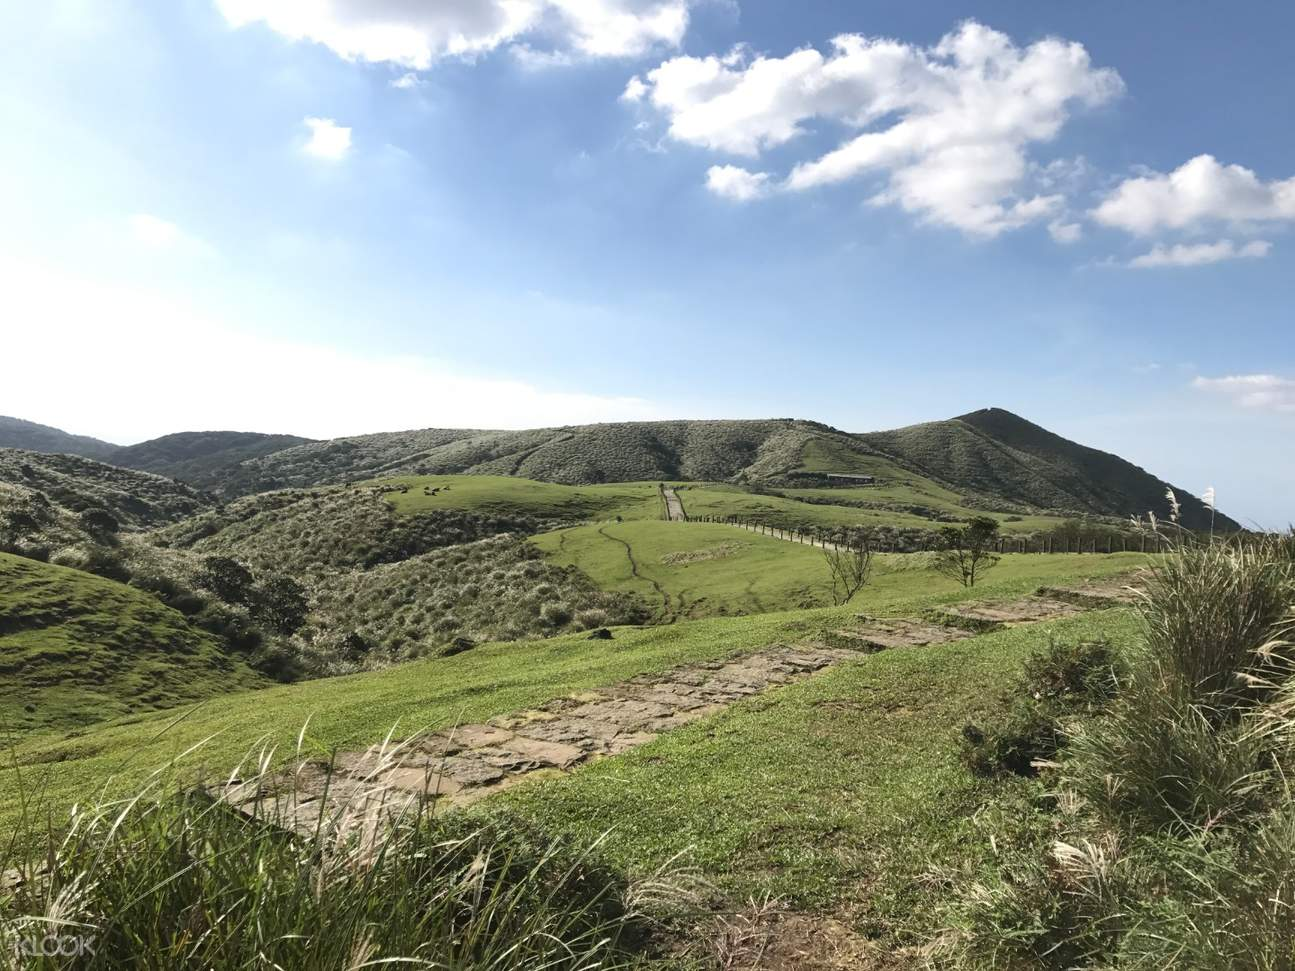 陽明山国家公園の景観。